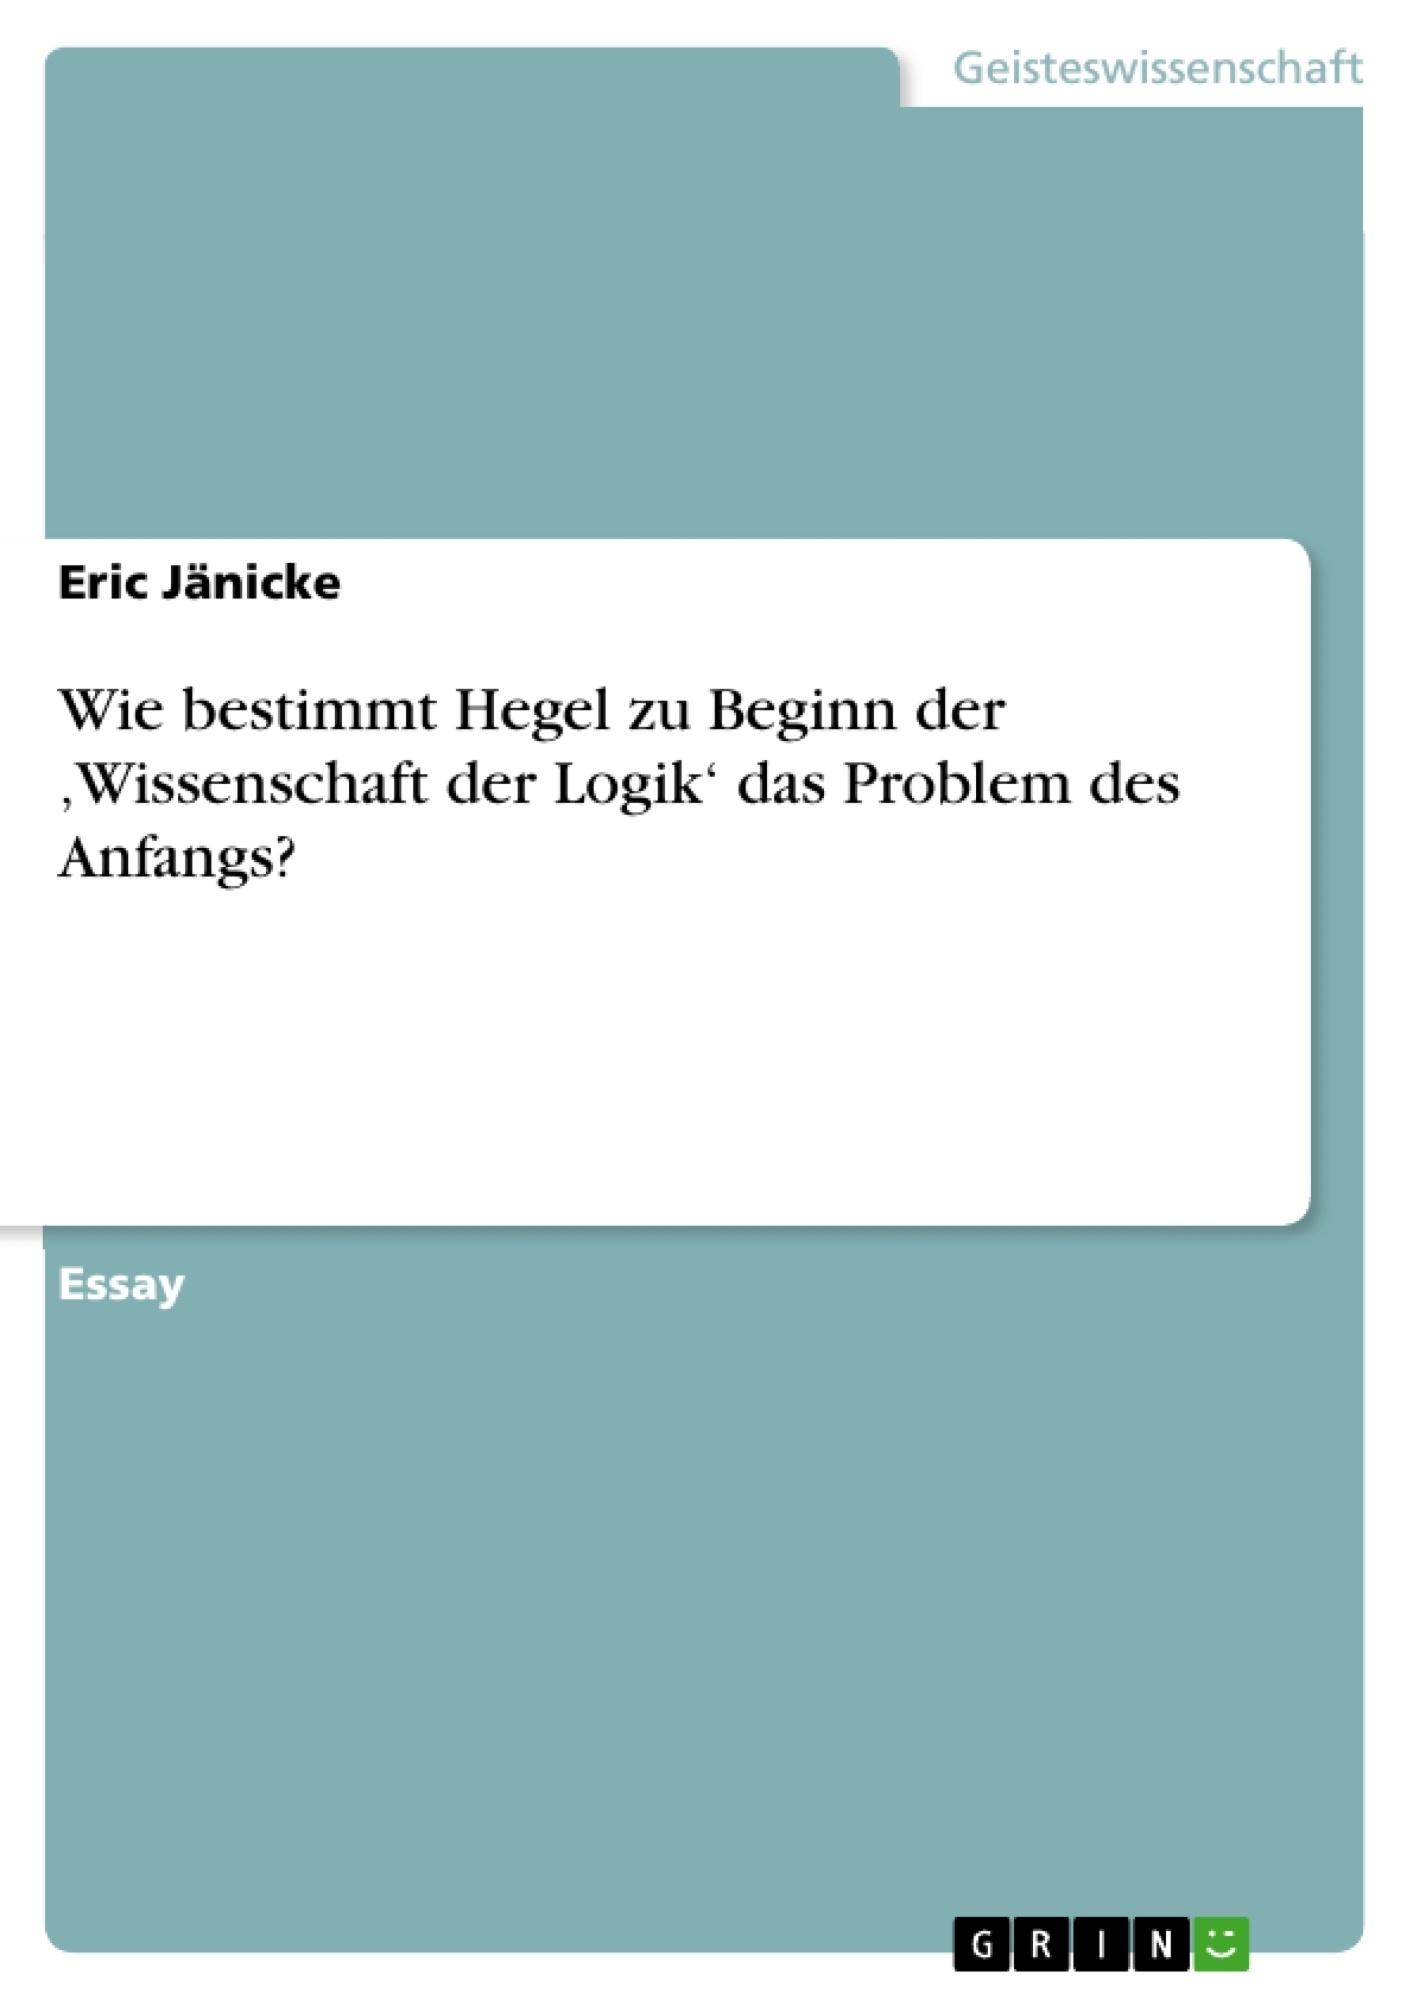 Titel: Wie bestimmt Hegel zu Beginn der 'Wissenschaft der Logik' das Problem des Anfangs?